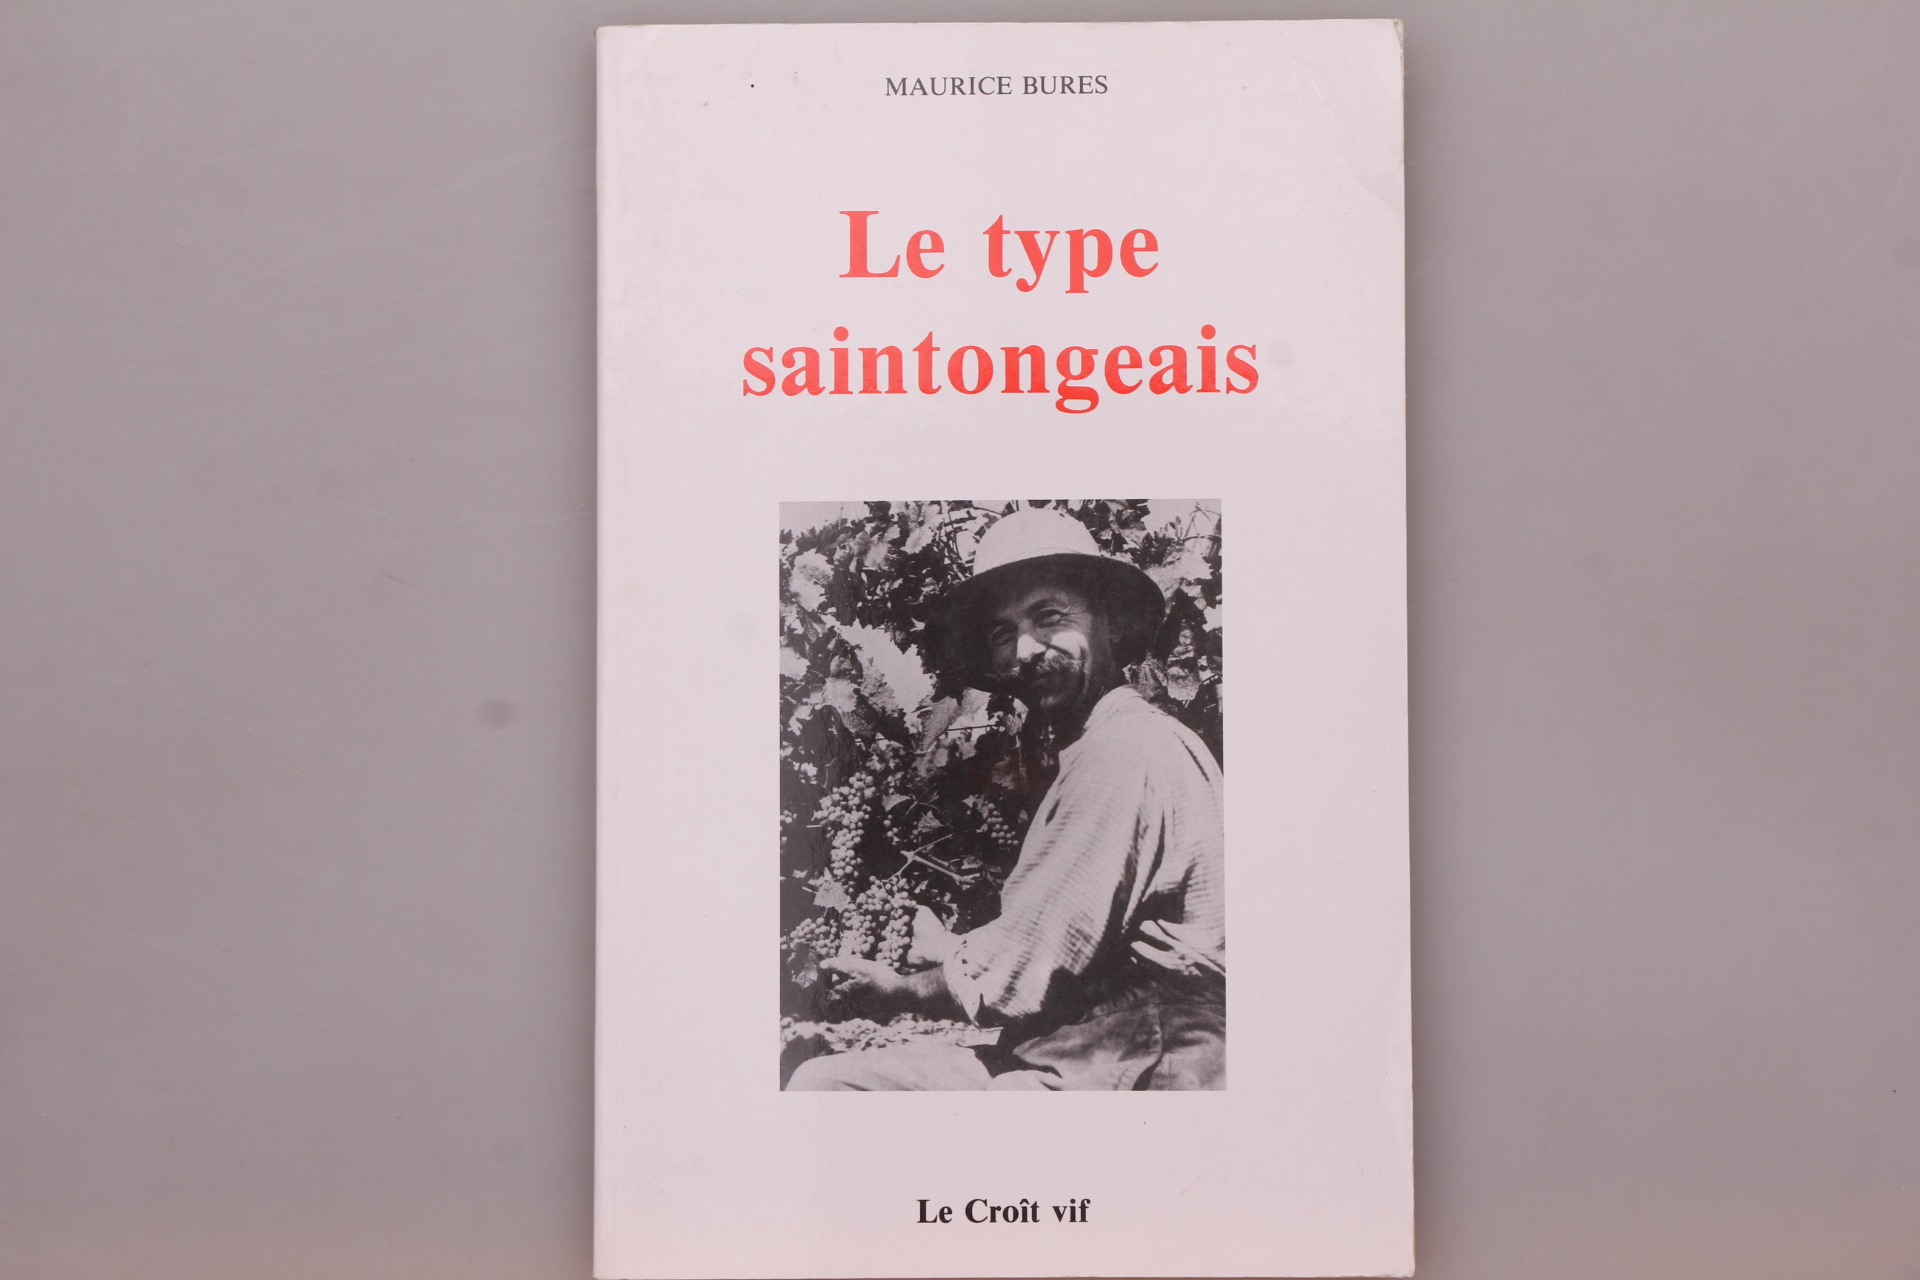 LE TYPE SAINTONGEAIS